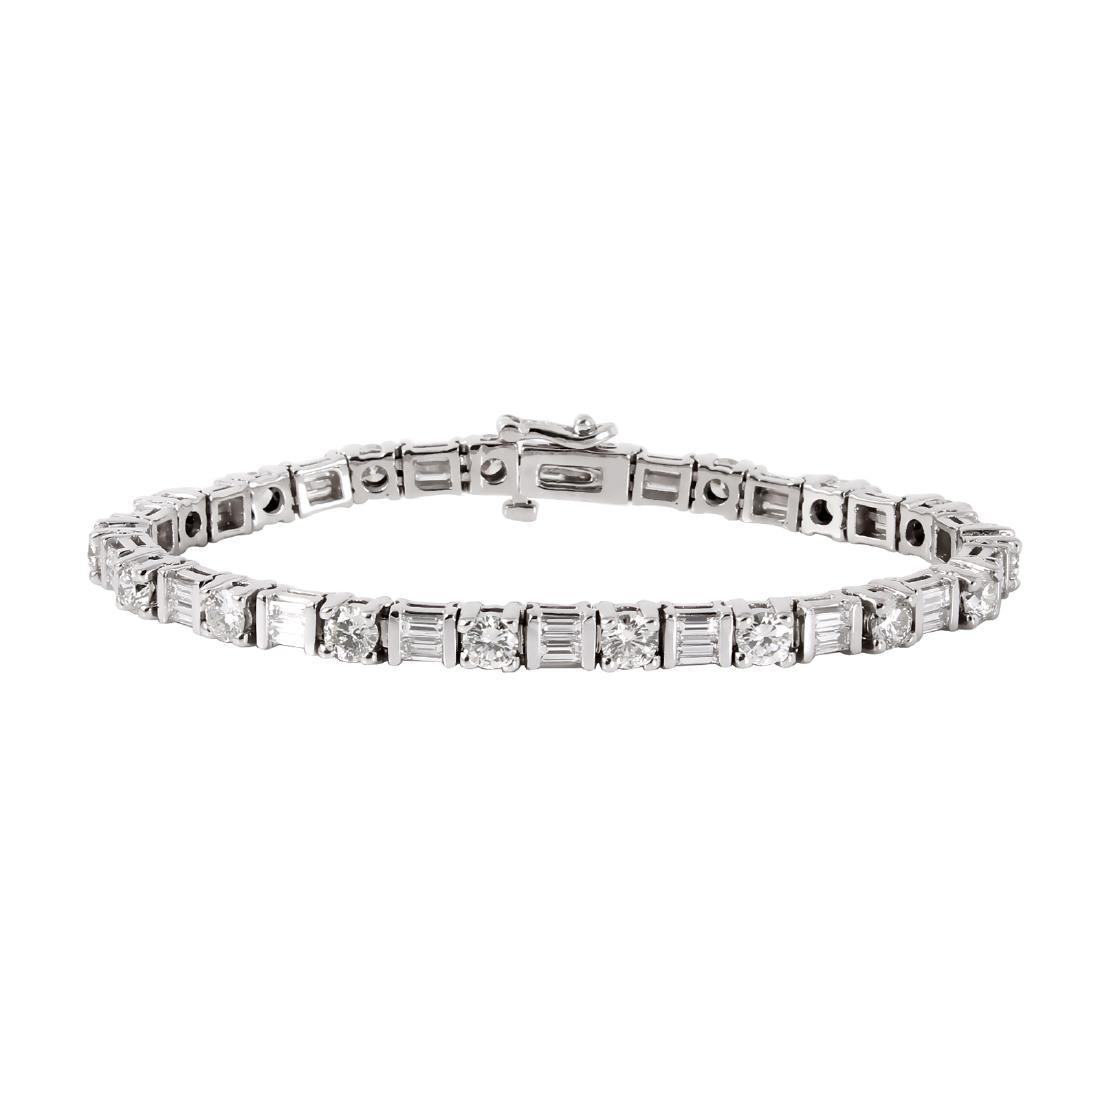 New Platinum 10.01ctw Diamond Tennis Bracelet Length